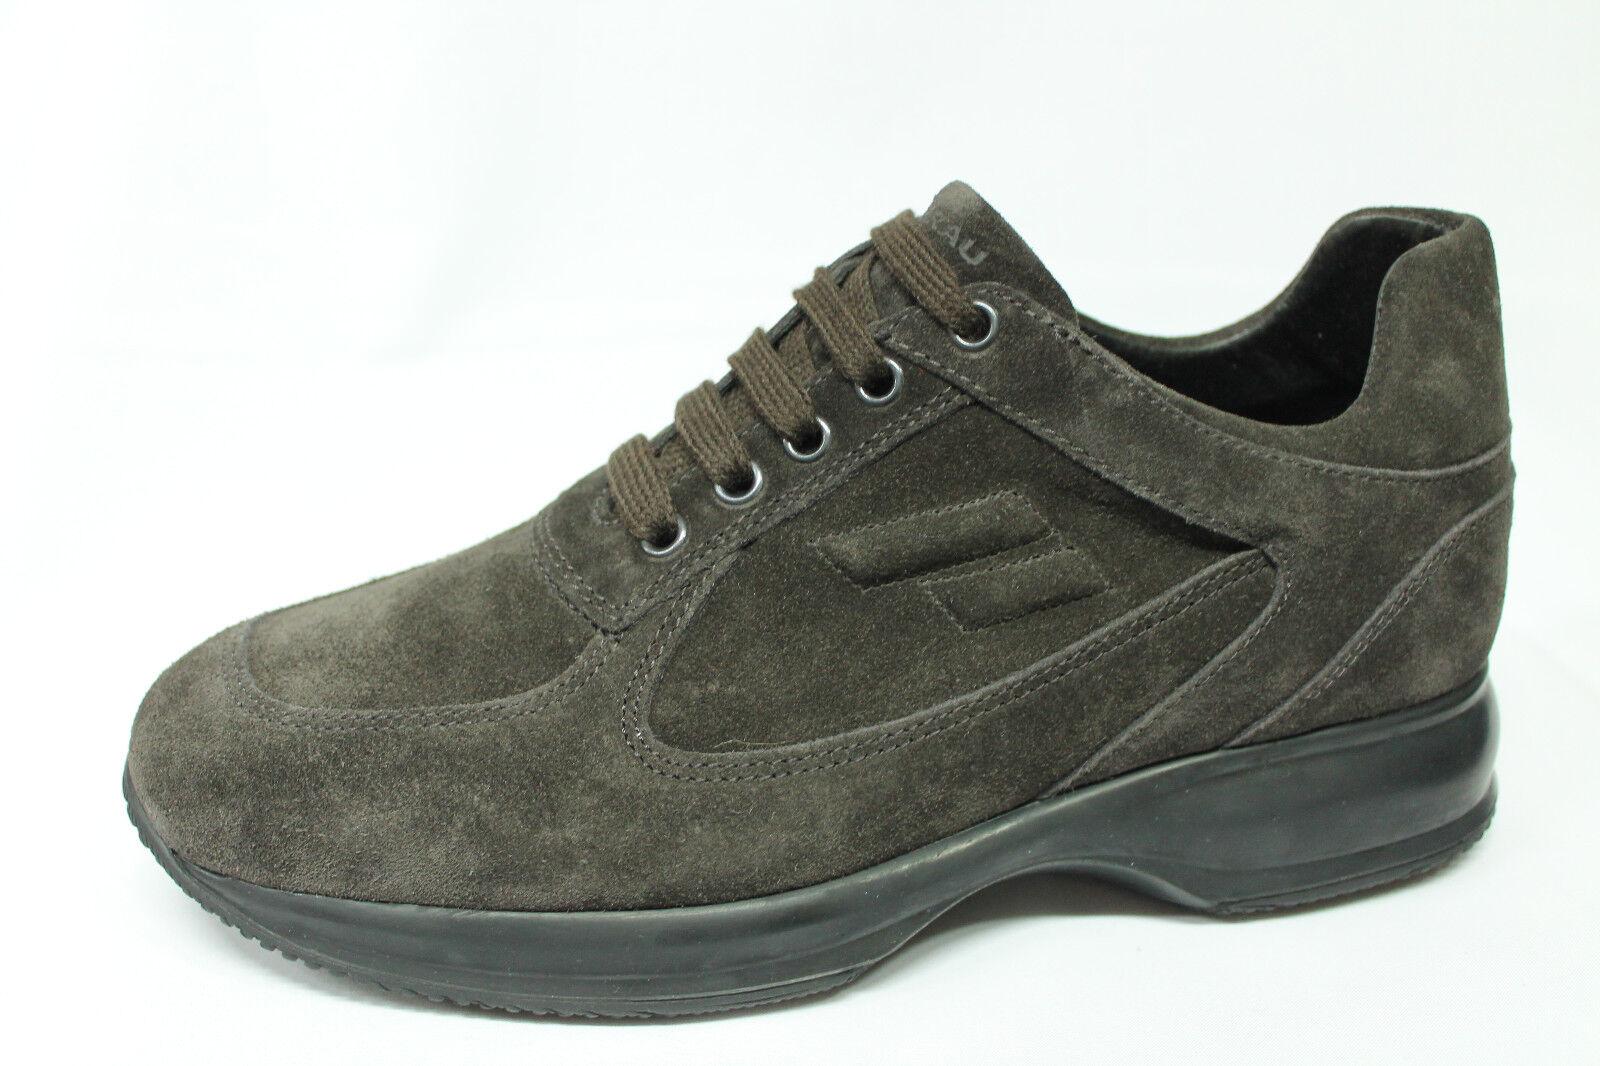 Sneakers Frau 24D3 testa di mgold tipo Hogan Made in  listino - 20%